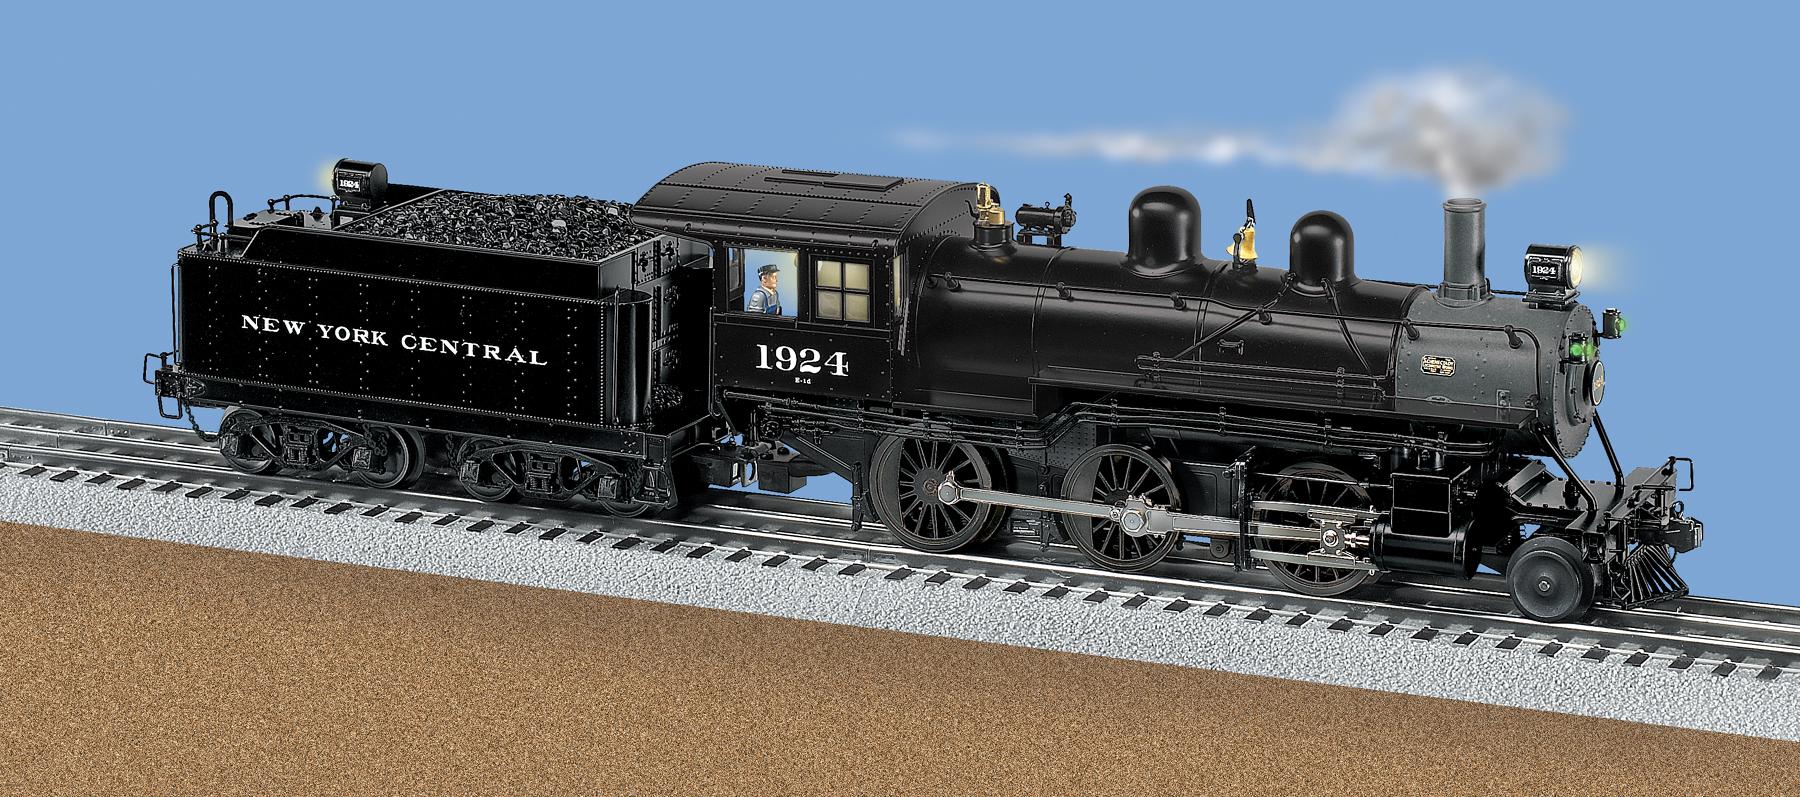 Lionel Track Wiring Diagram Library Switch New York Central Tmcc Scale 2 6 0 Mogul Steam Locomotive 1924 Rh Com